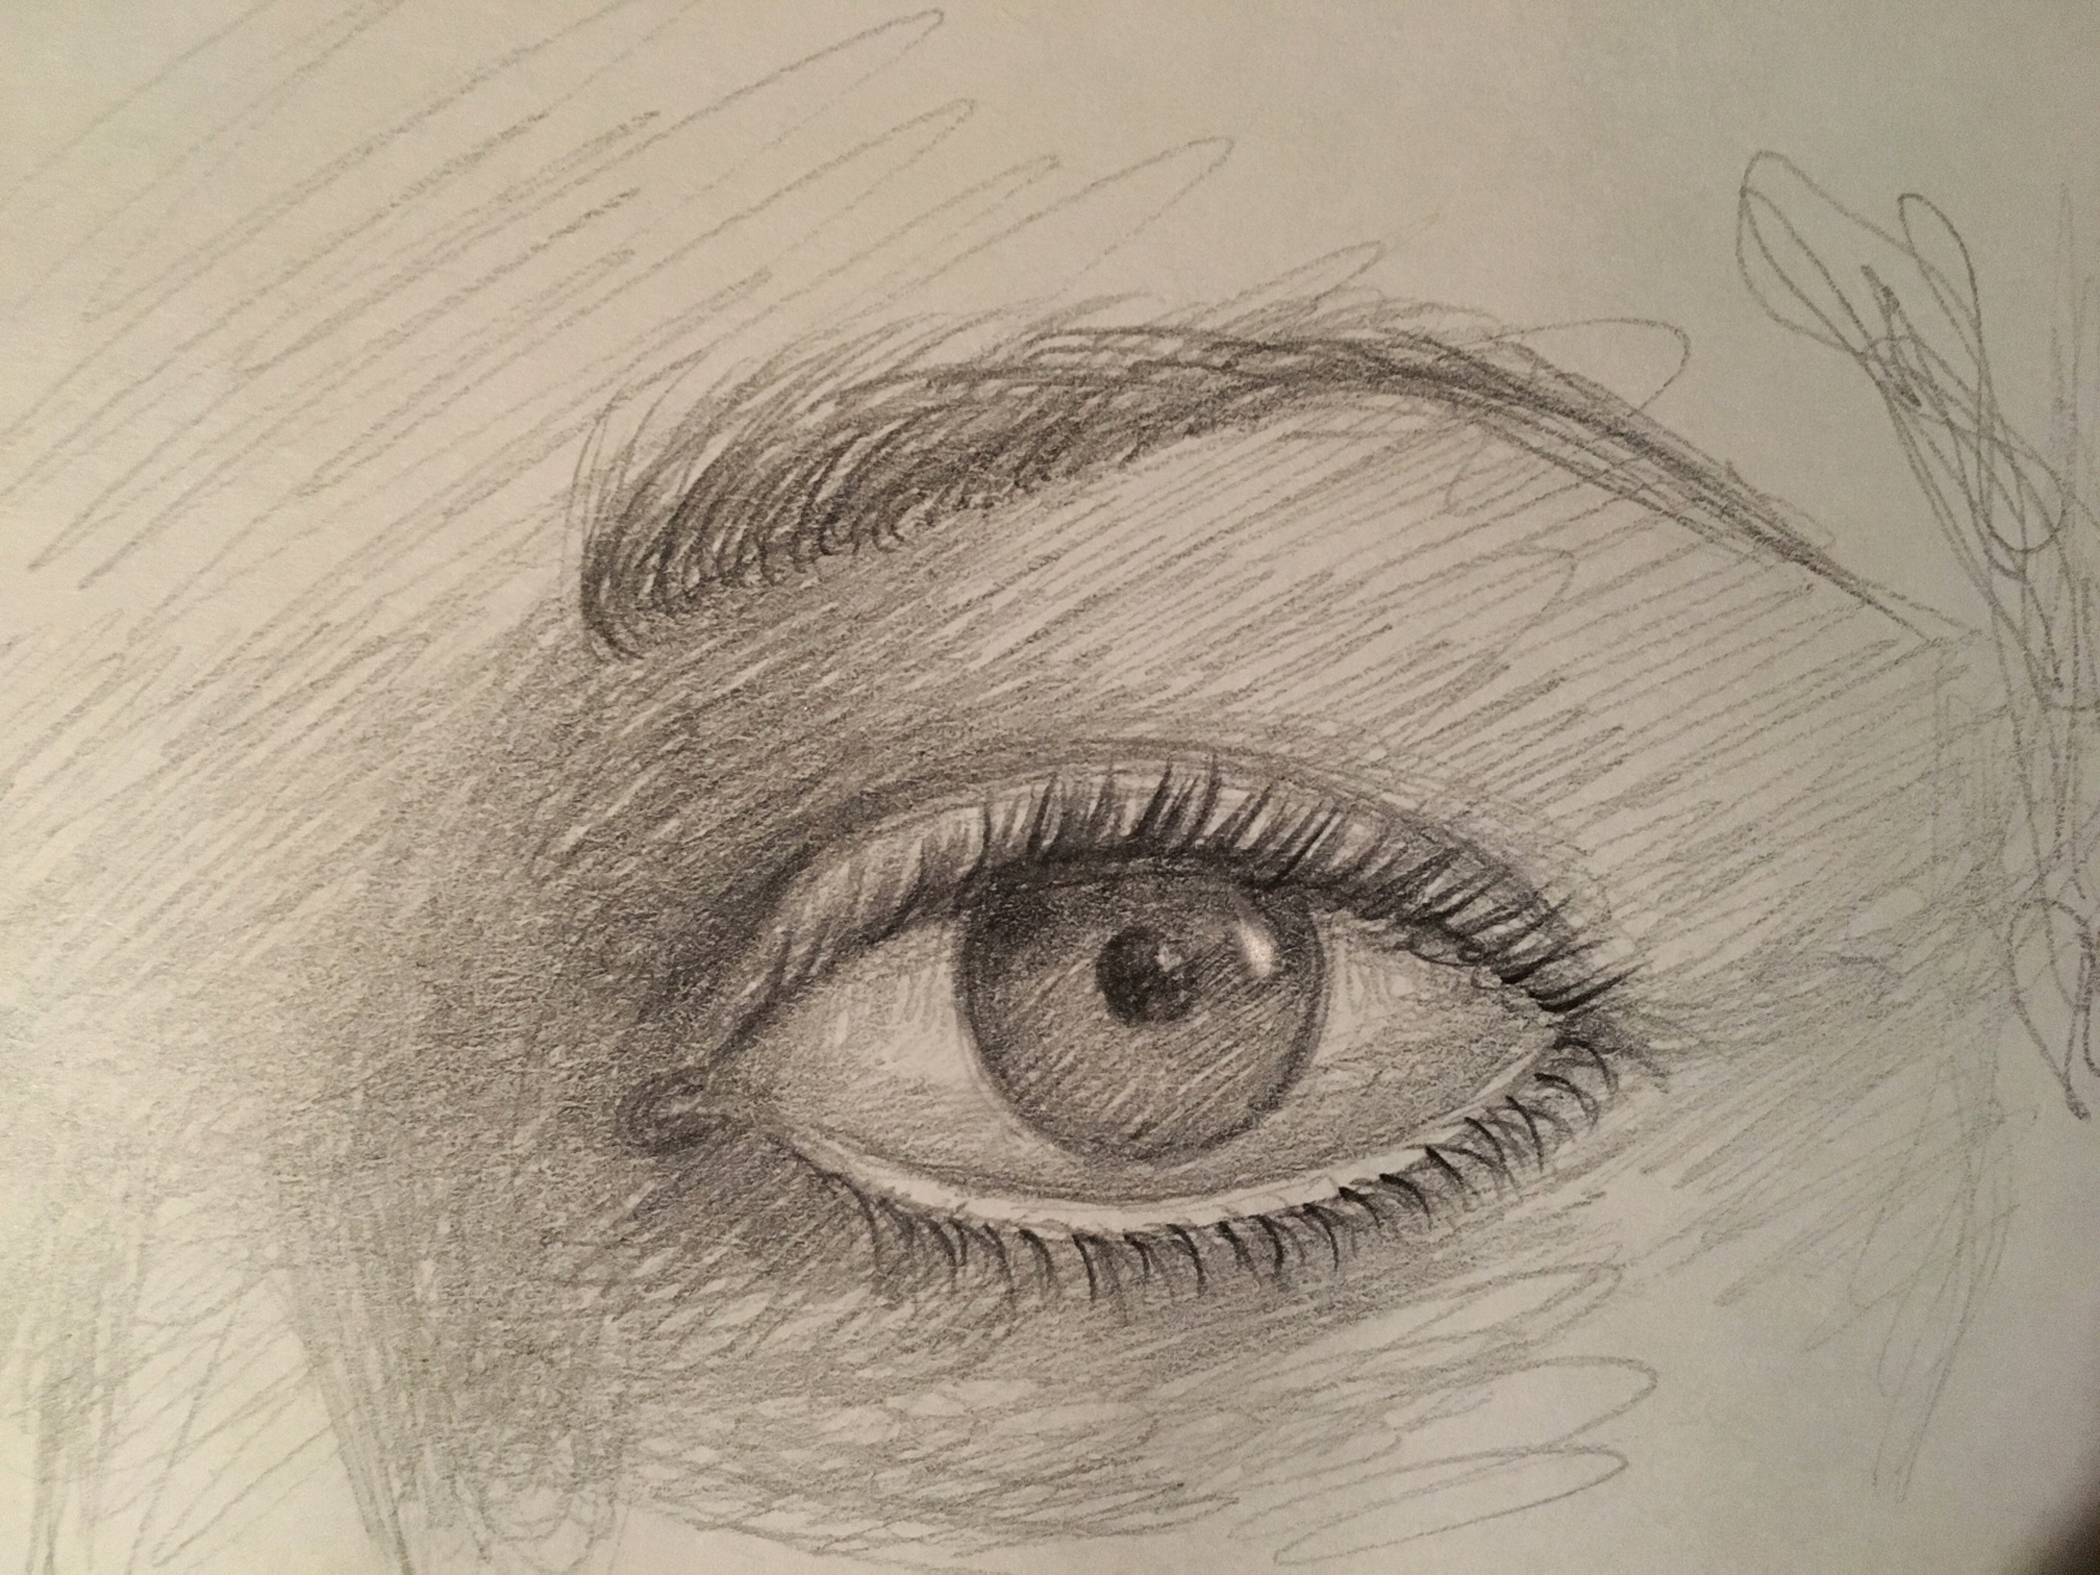 "Eye sketch , graphite, 4"" x 6"", 2018"